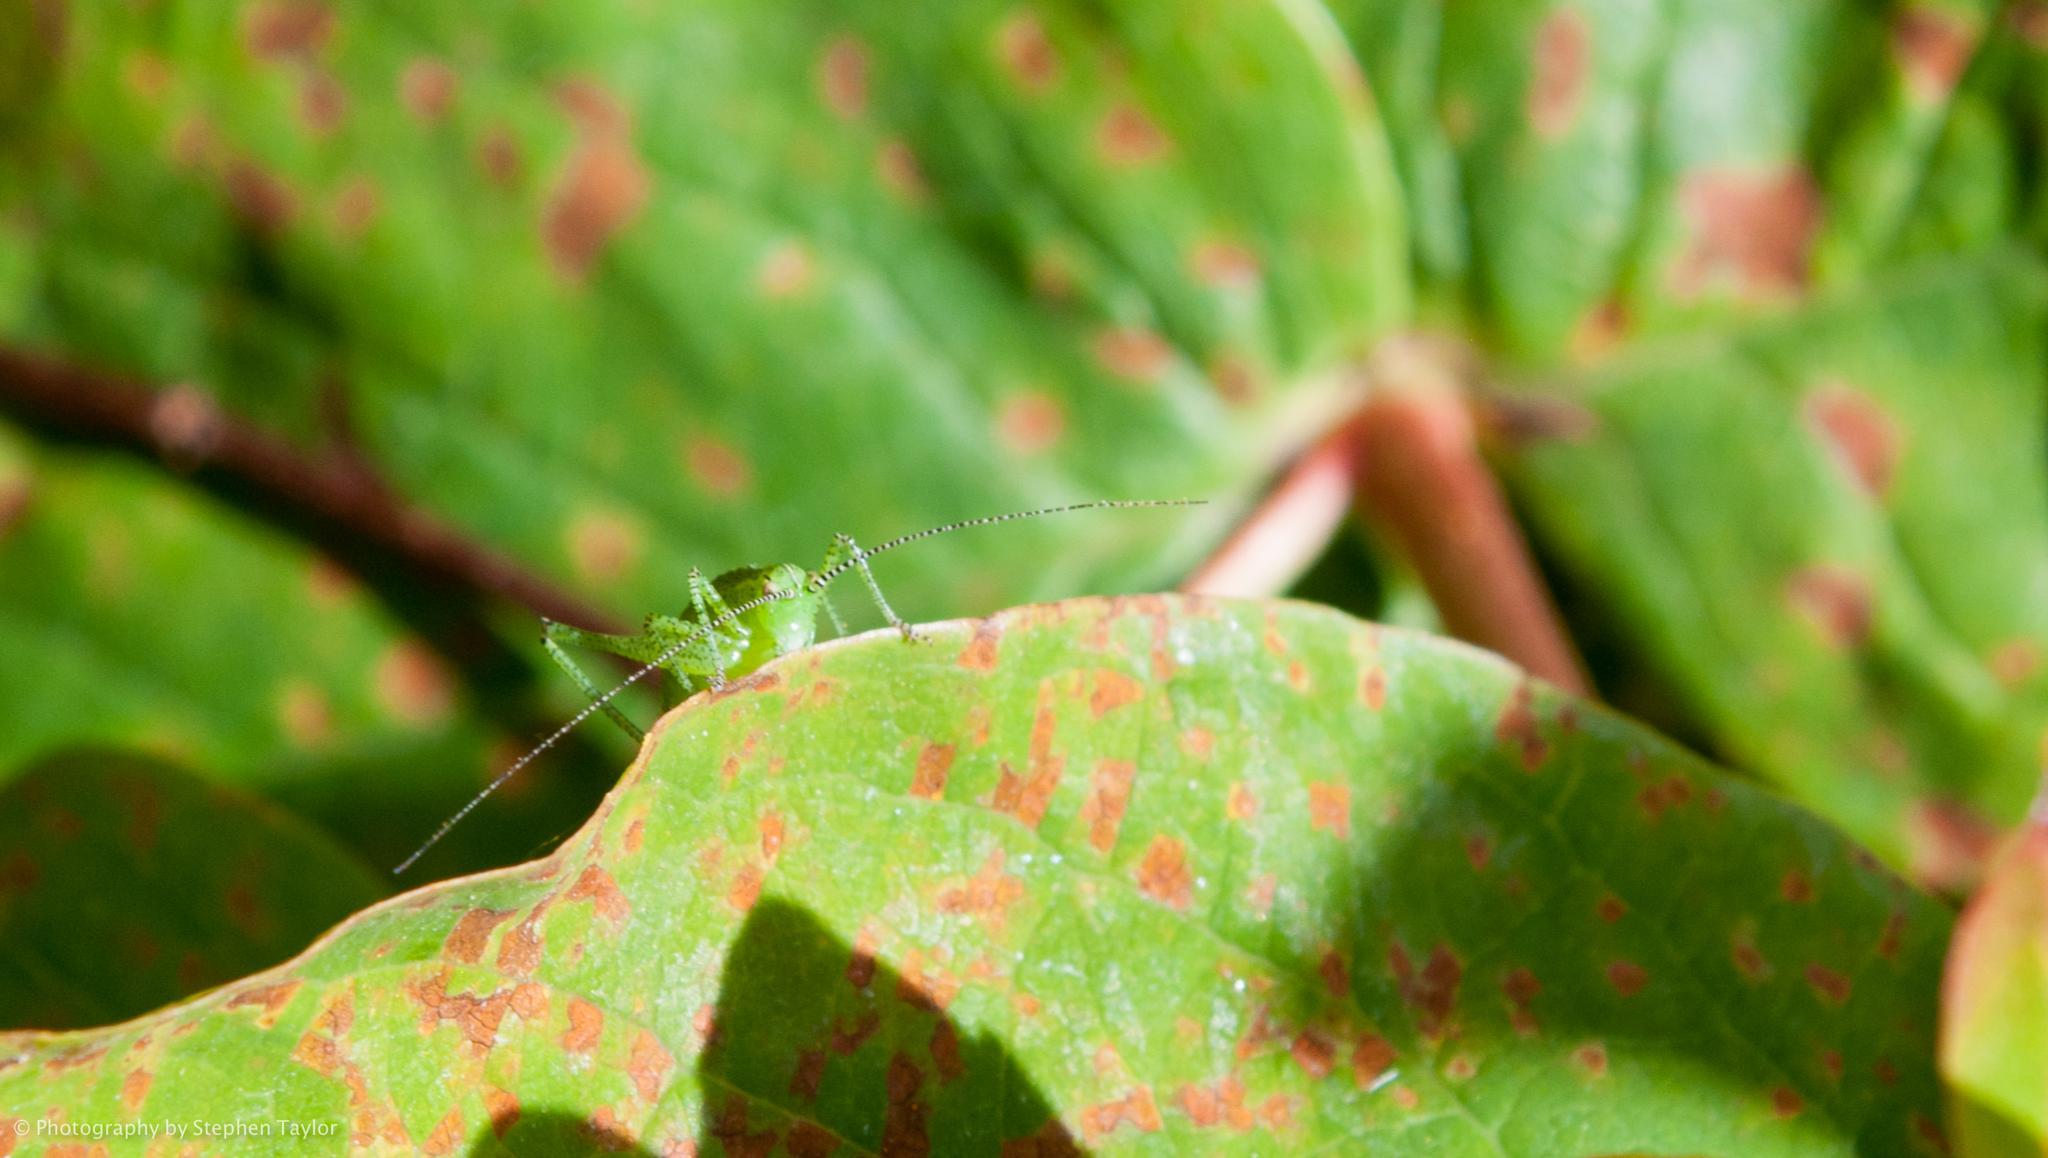 Grasshopper on leaf 2 by Stephen Taylor